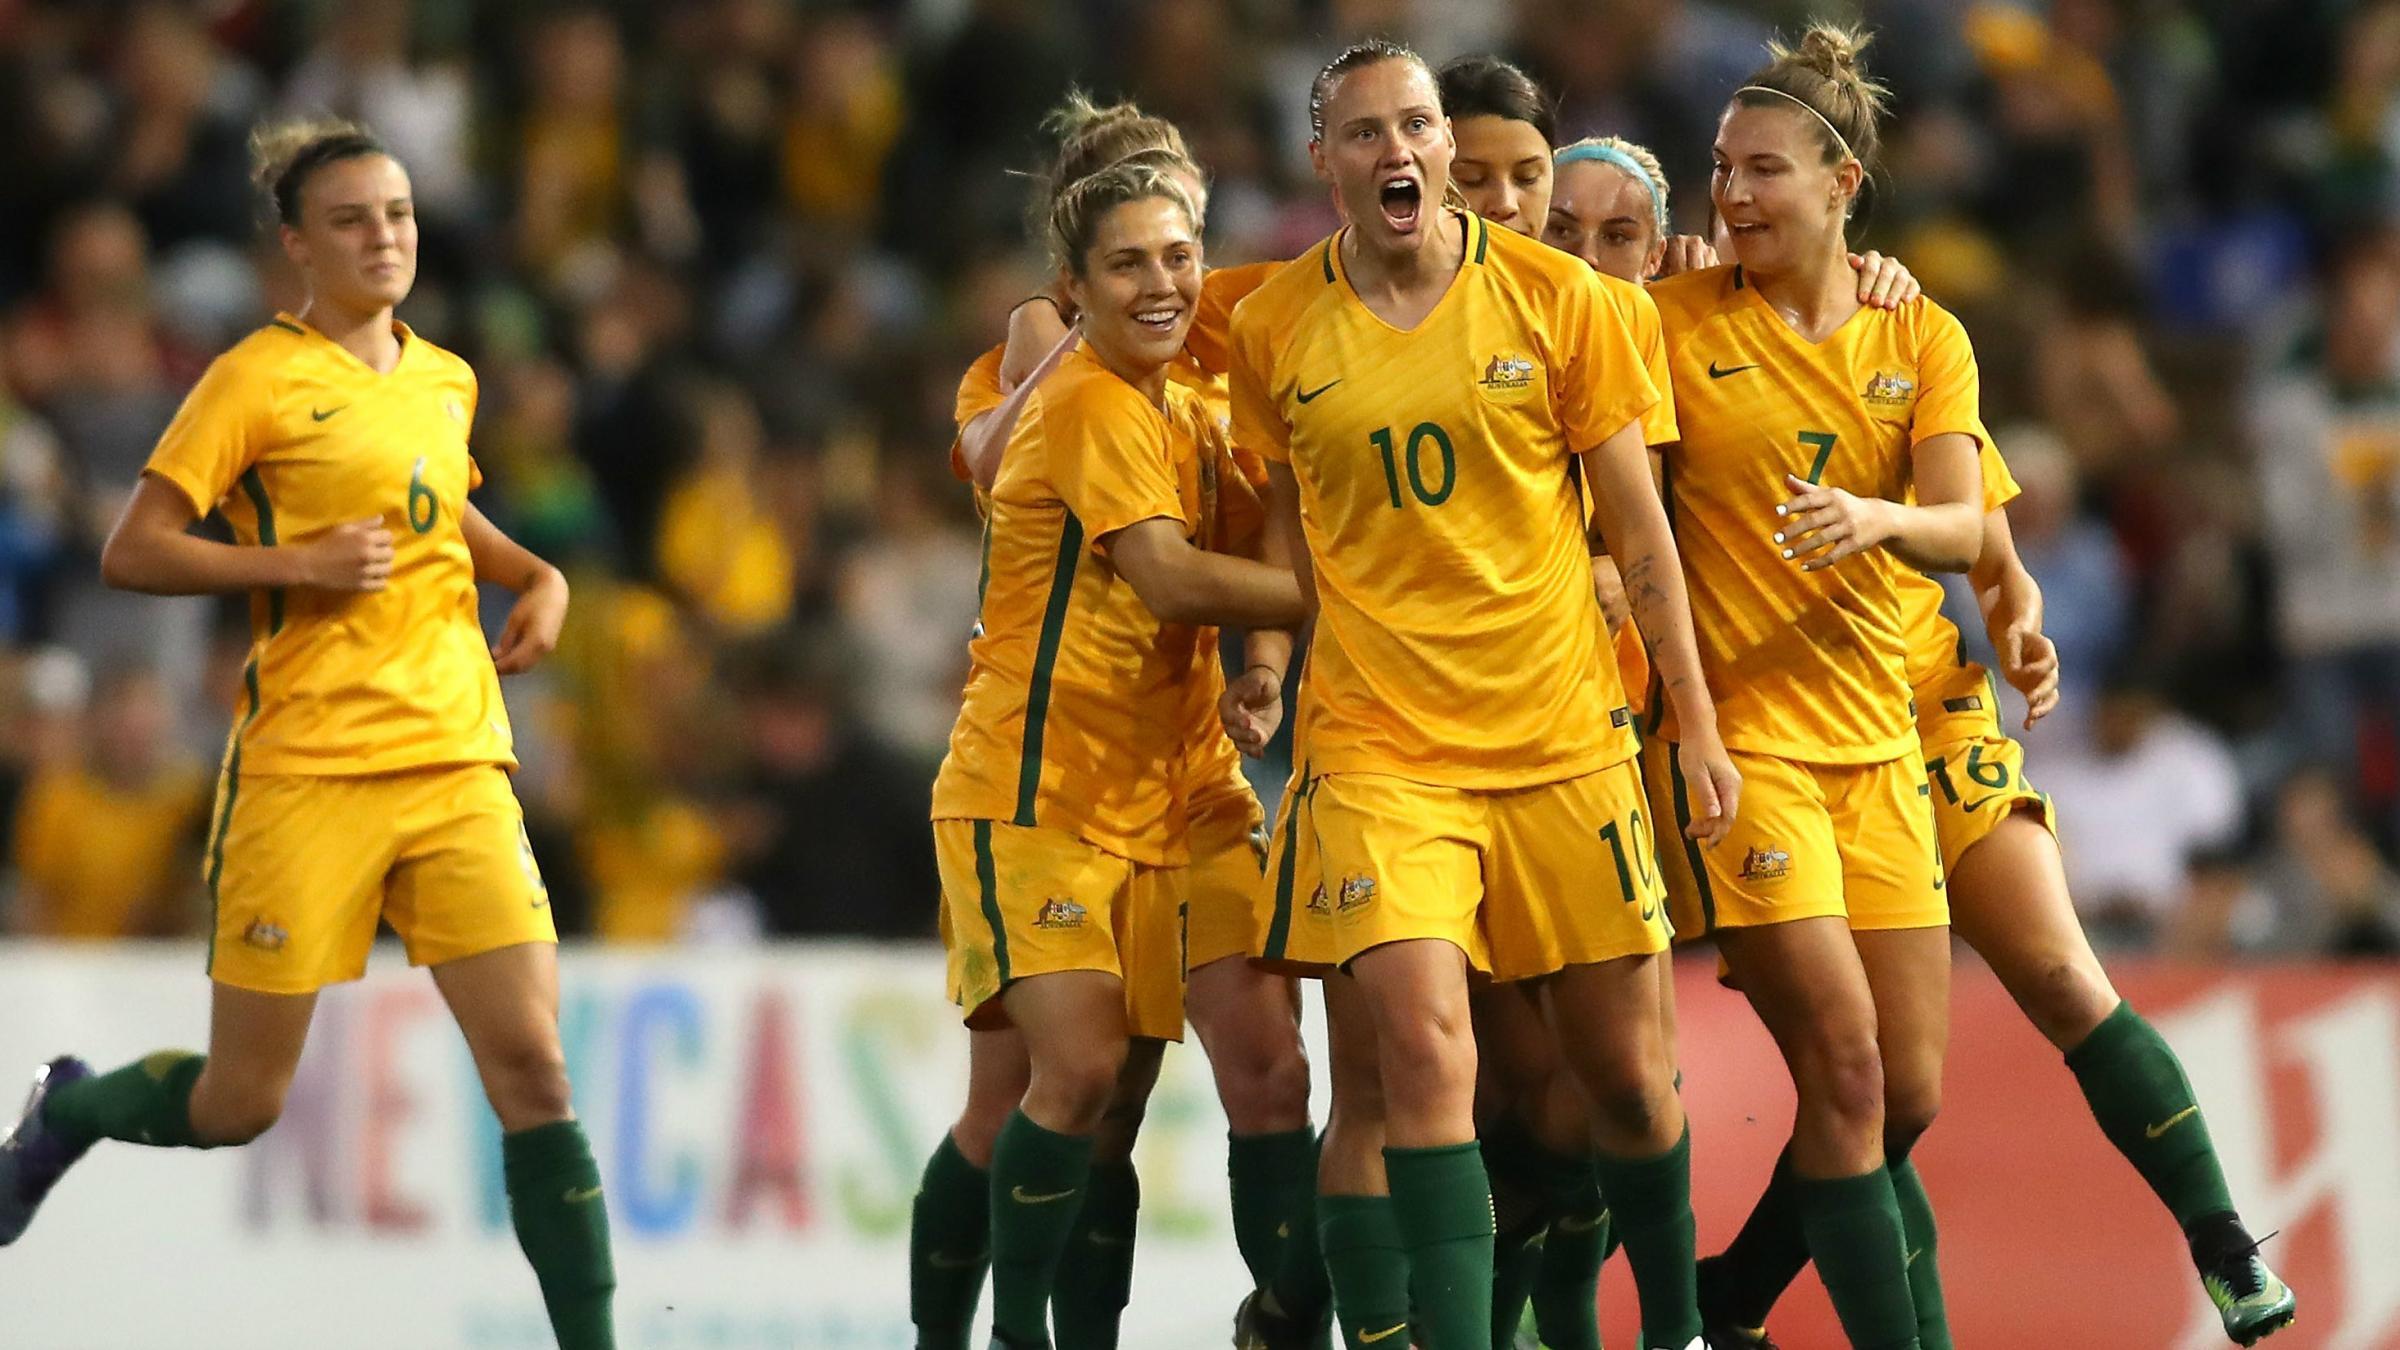 The Westfield Matildas celebrate a goal in he 3-2 win over Brazil in Newcastle.